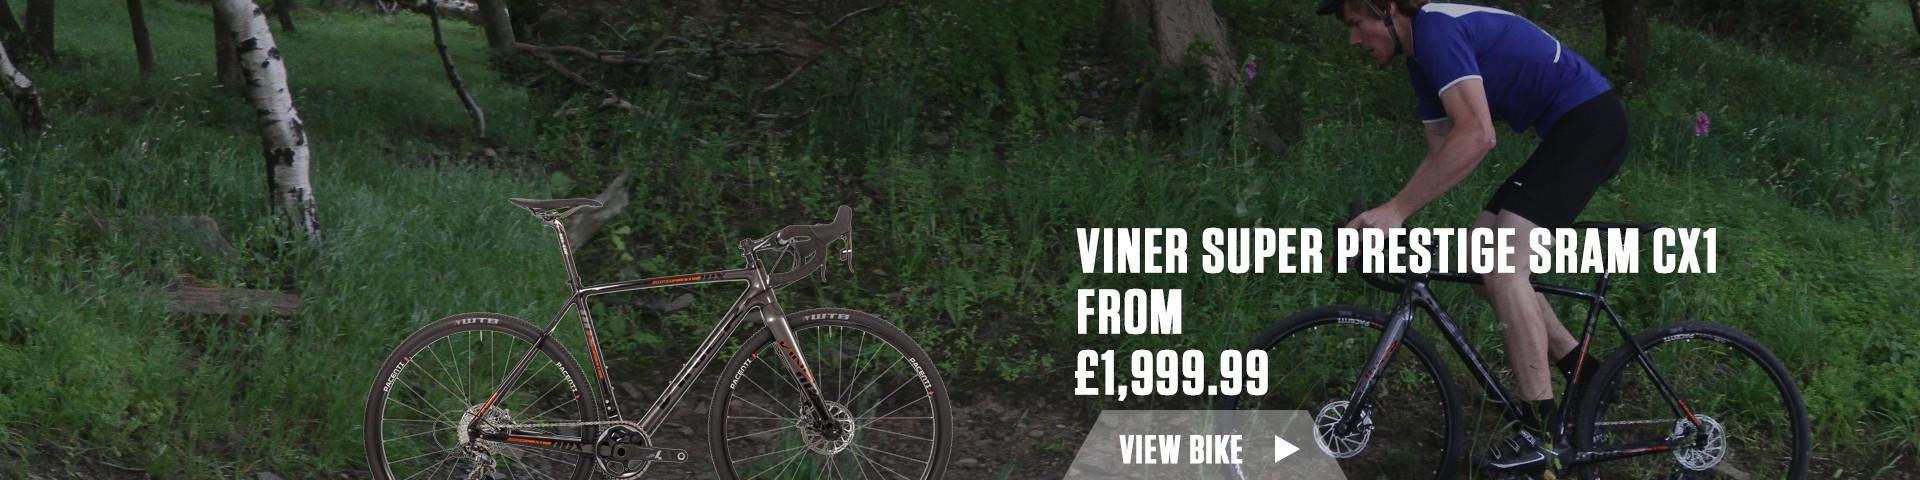 Viner Super Prestige Sram CX1 Cyclo-Cross Bike